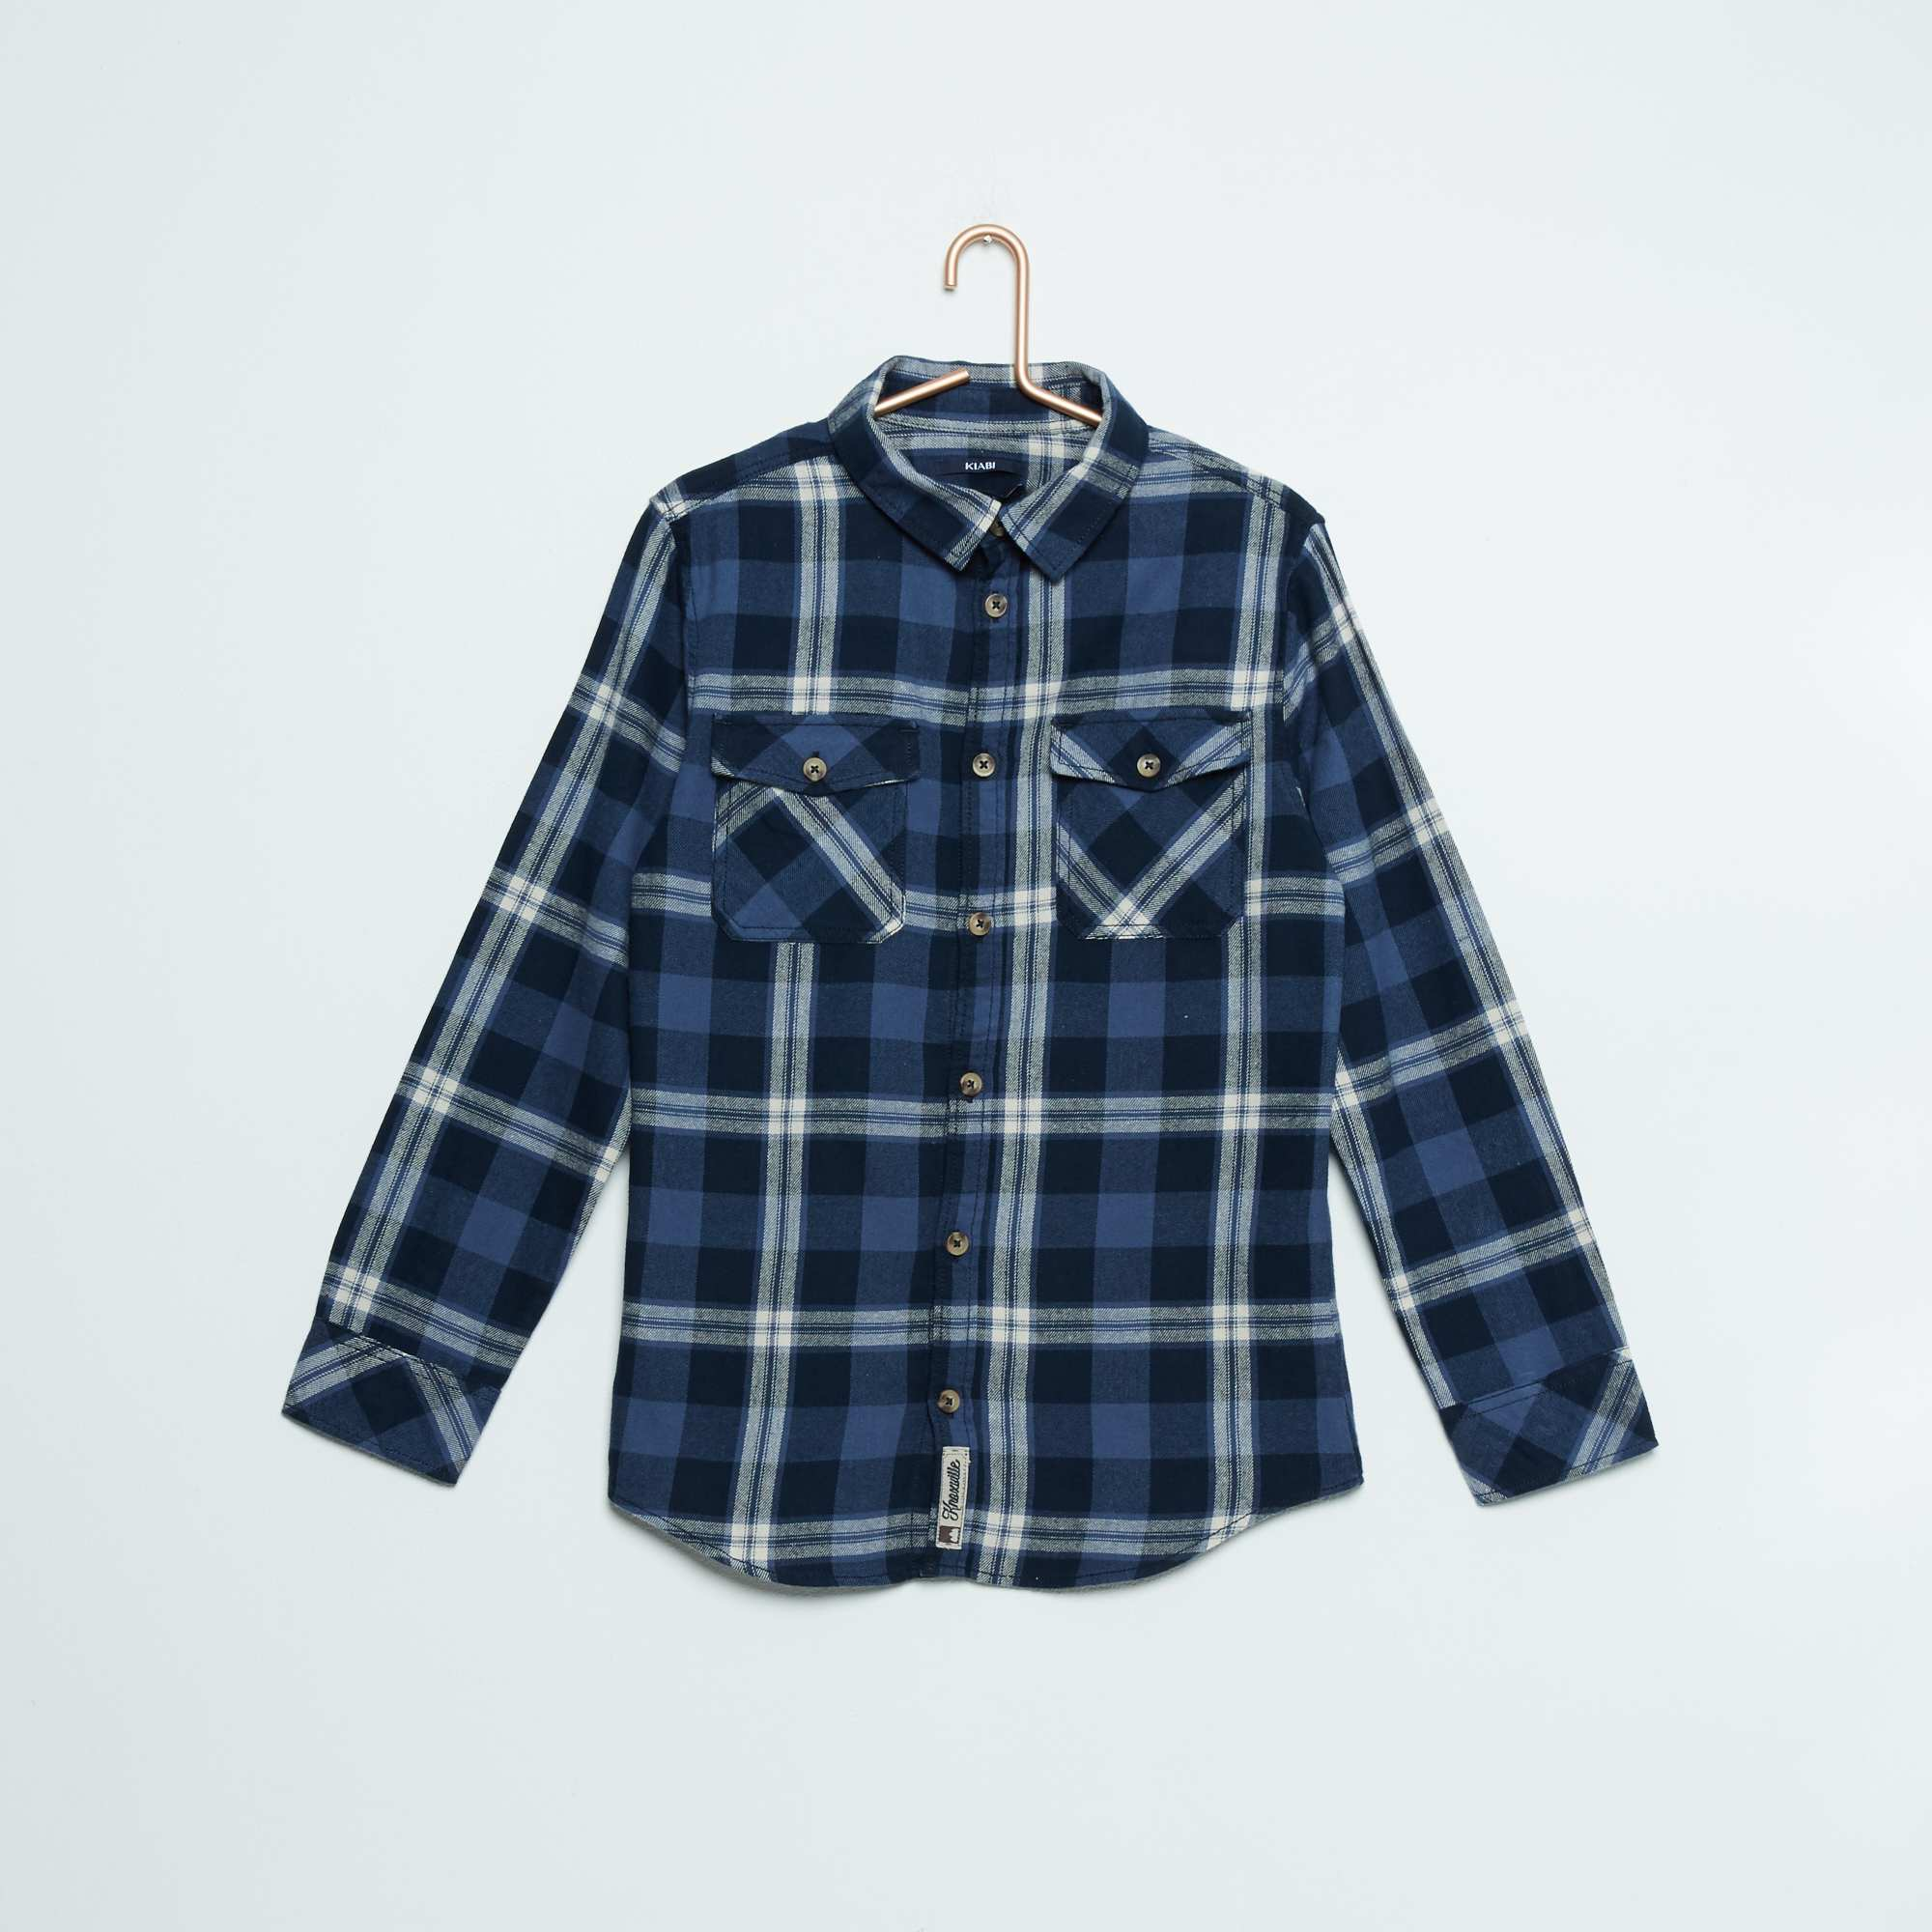 chemise 100 coton gar on adolescent carreaux bleu kiabi 7 50. Black Bedroom Furniture Sets. Home Design Ideas